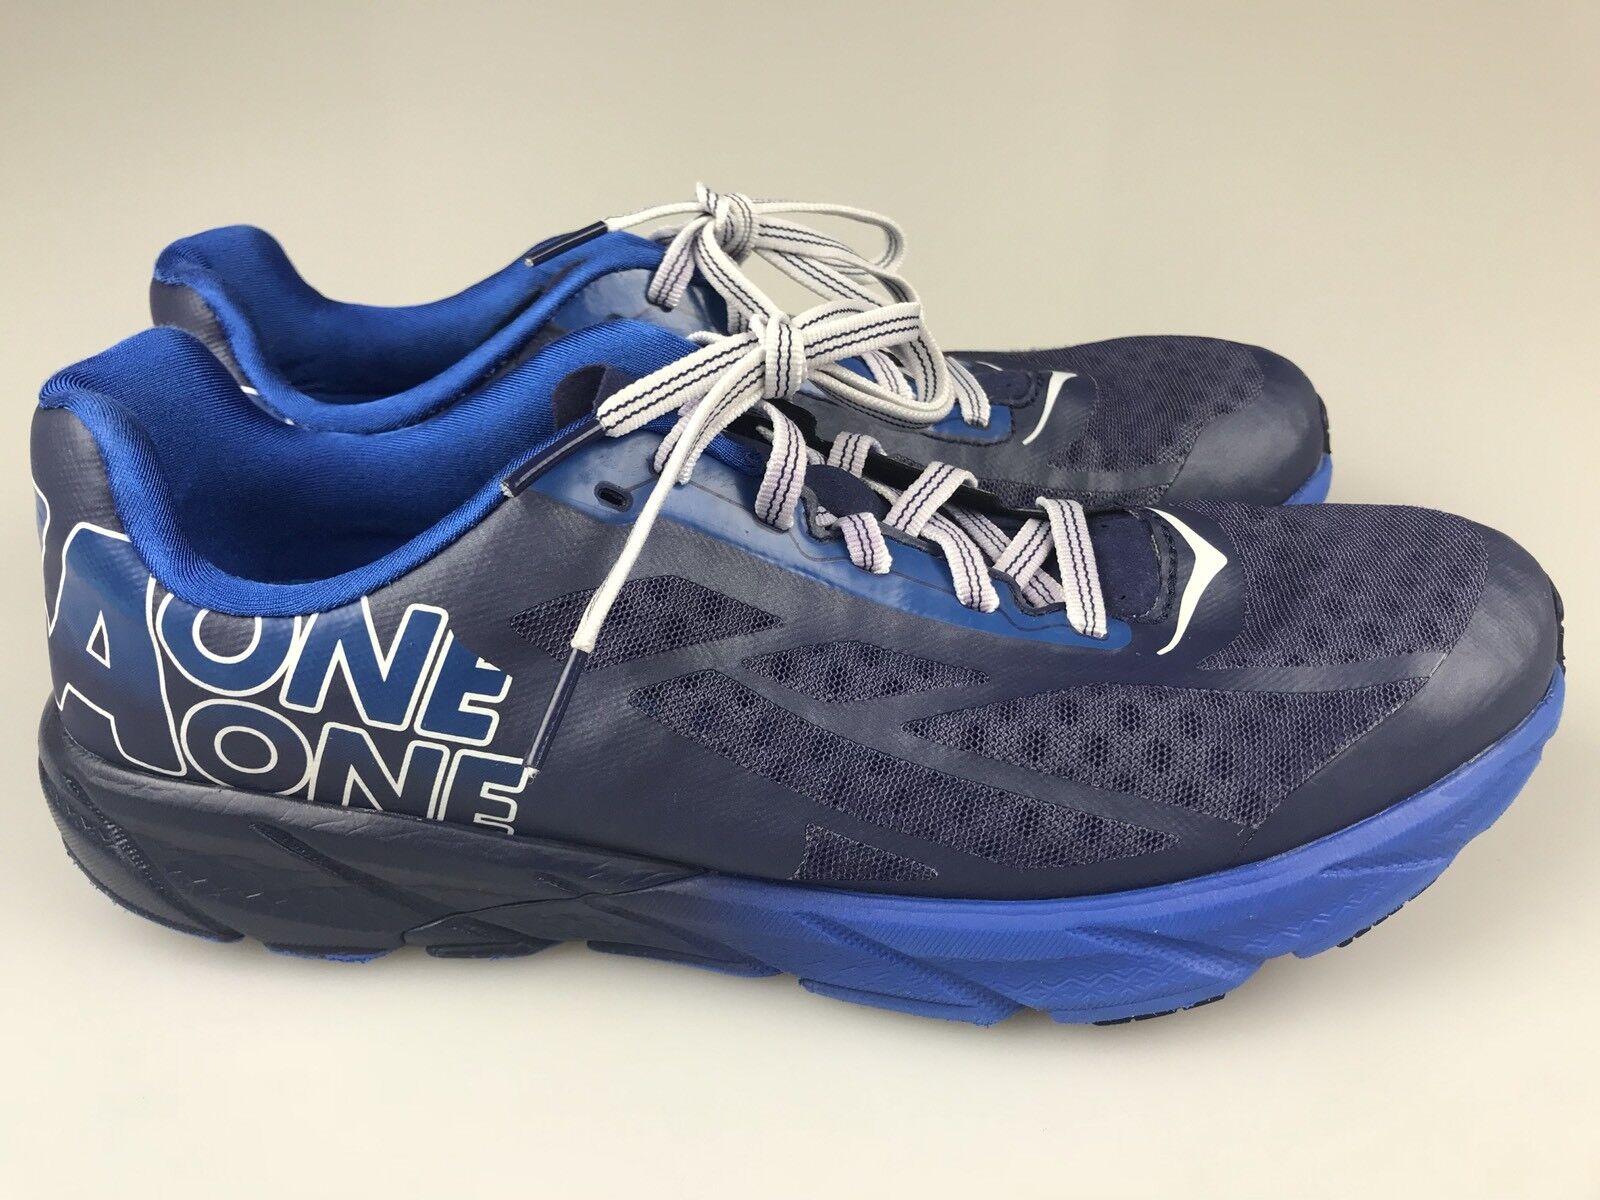 Hoka One One Trazador para Hombre Ligero Running Zapatos de EE. UU. 42 2 3 Azul